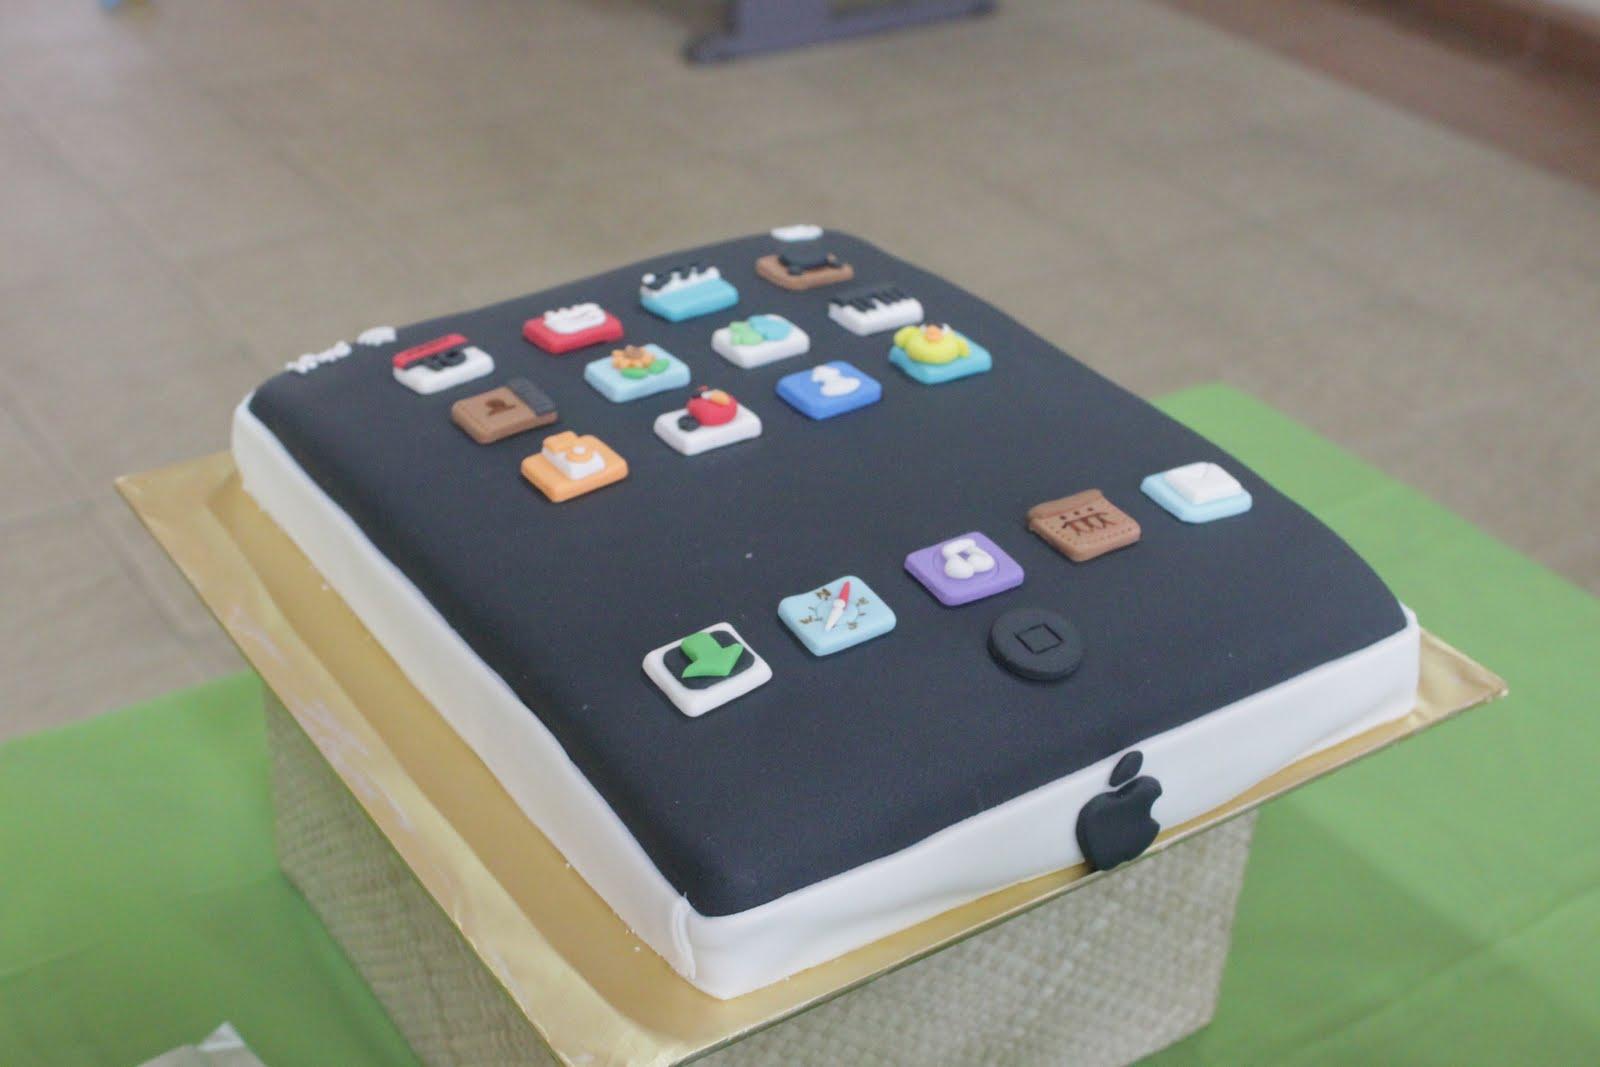 Comelicious Ipad Cake